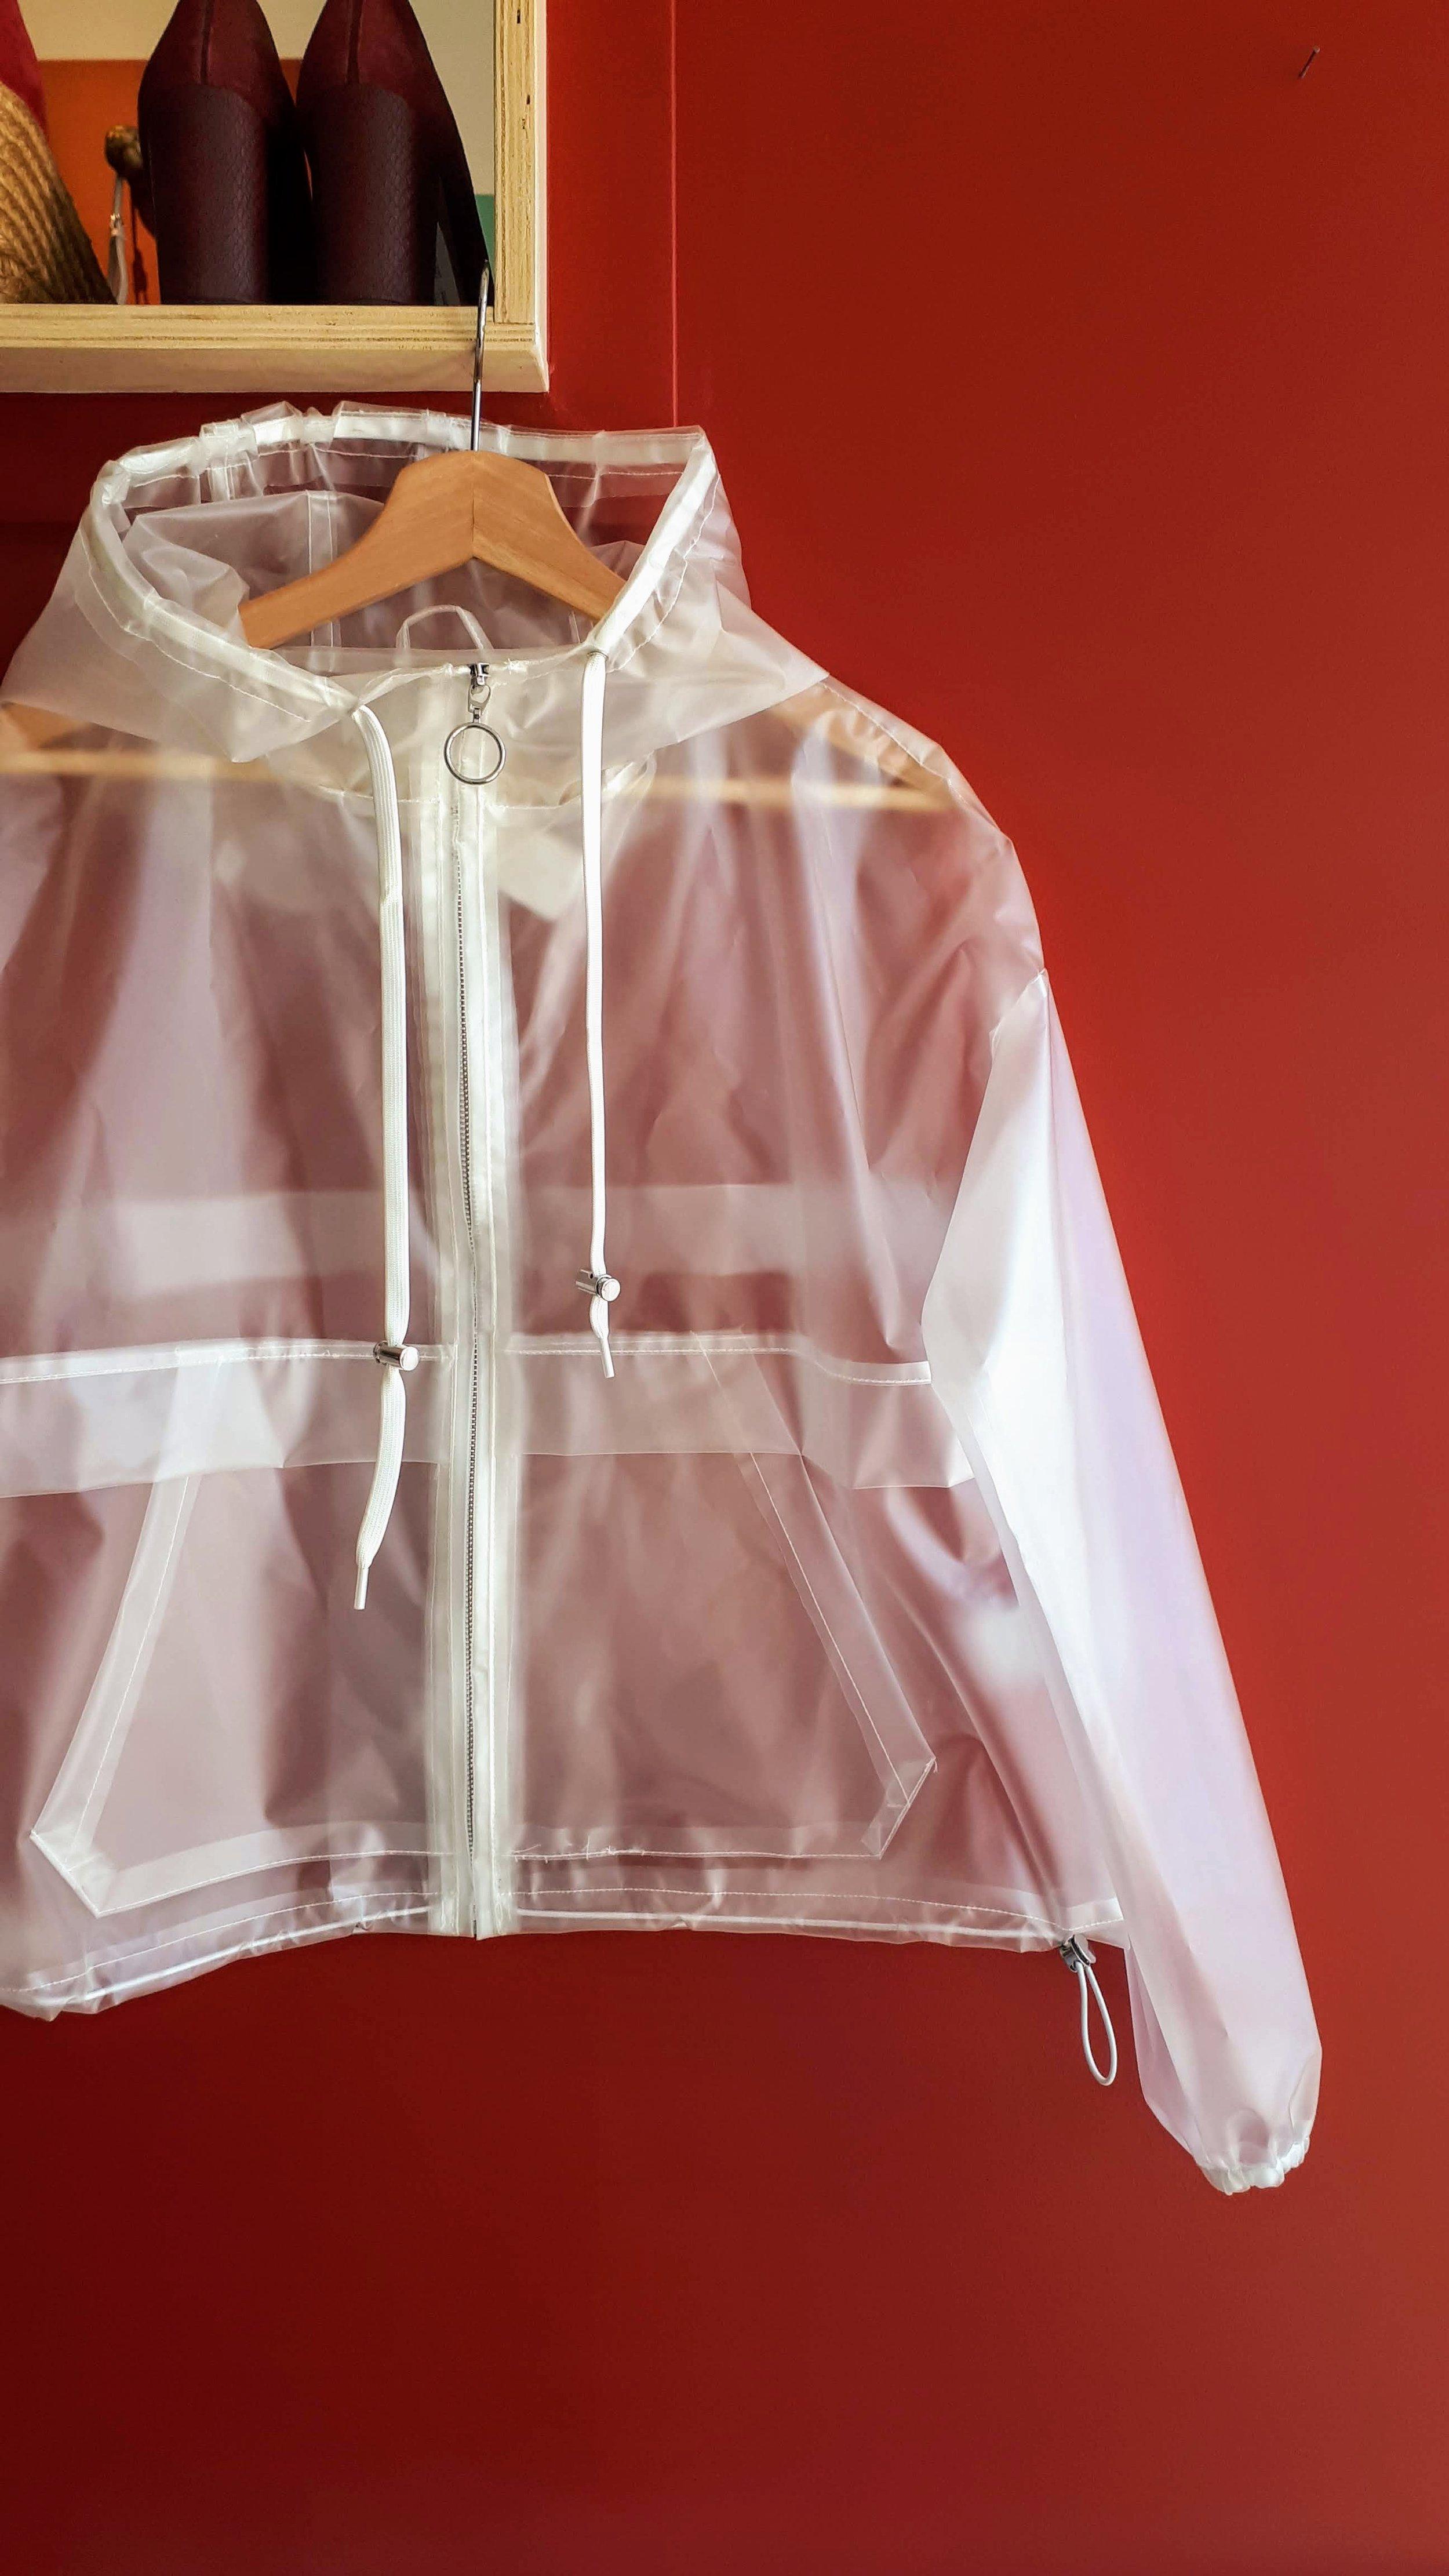 Elodie jacket; Size S, $32